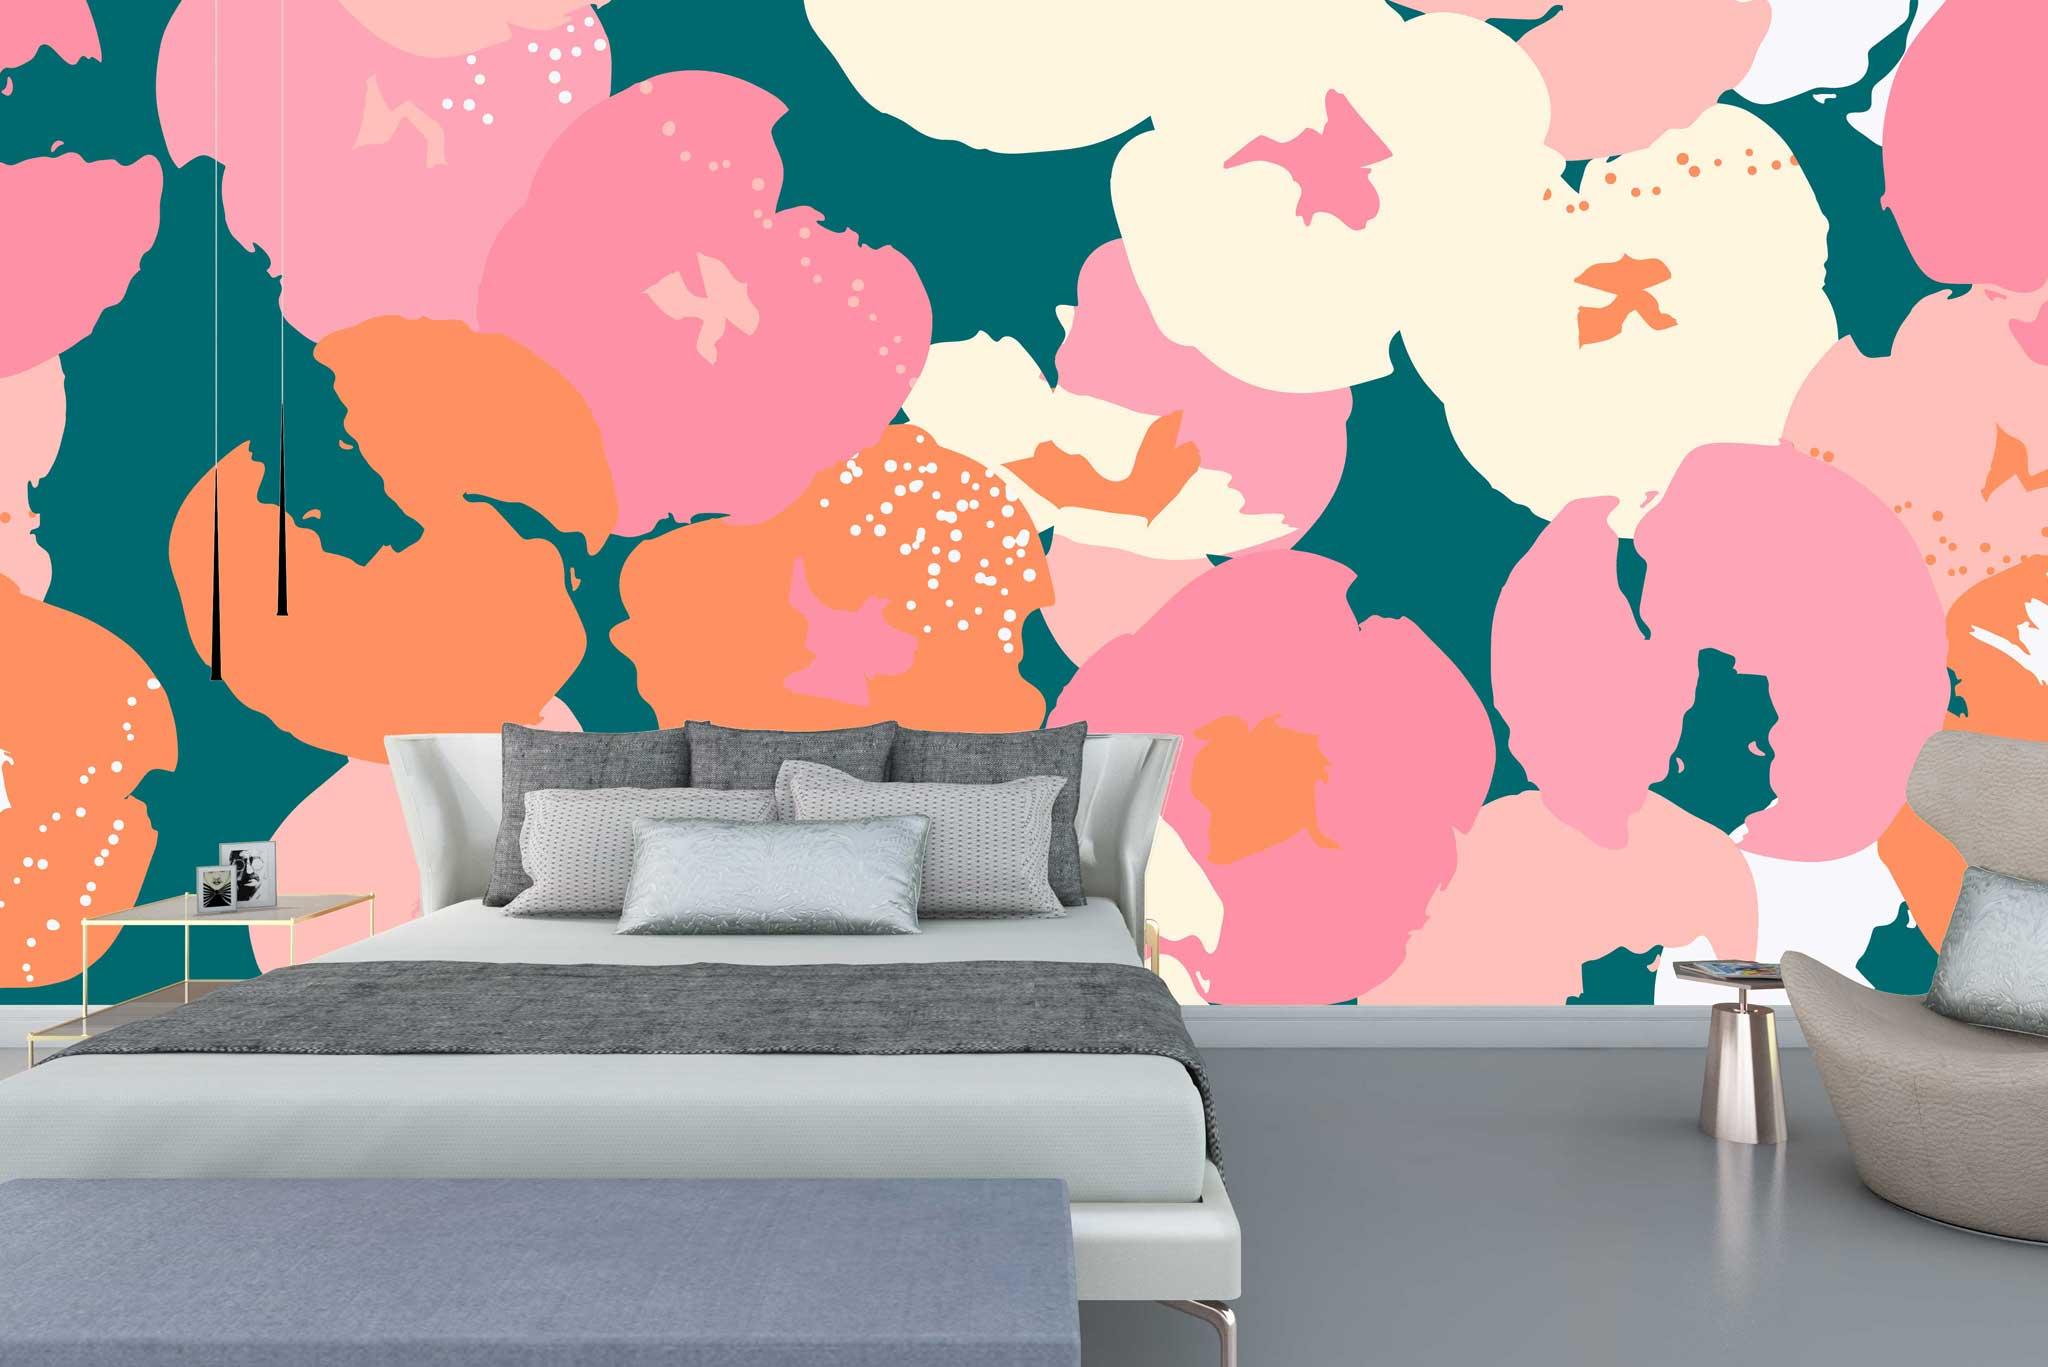 tapet-fototapet-comanda-personalizat-bucuresti-perete-special-lux-model-pictura-desen-multicolor-flori